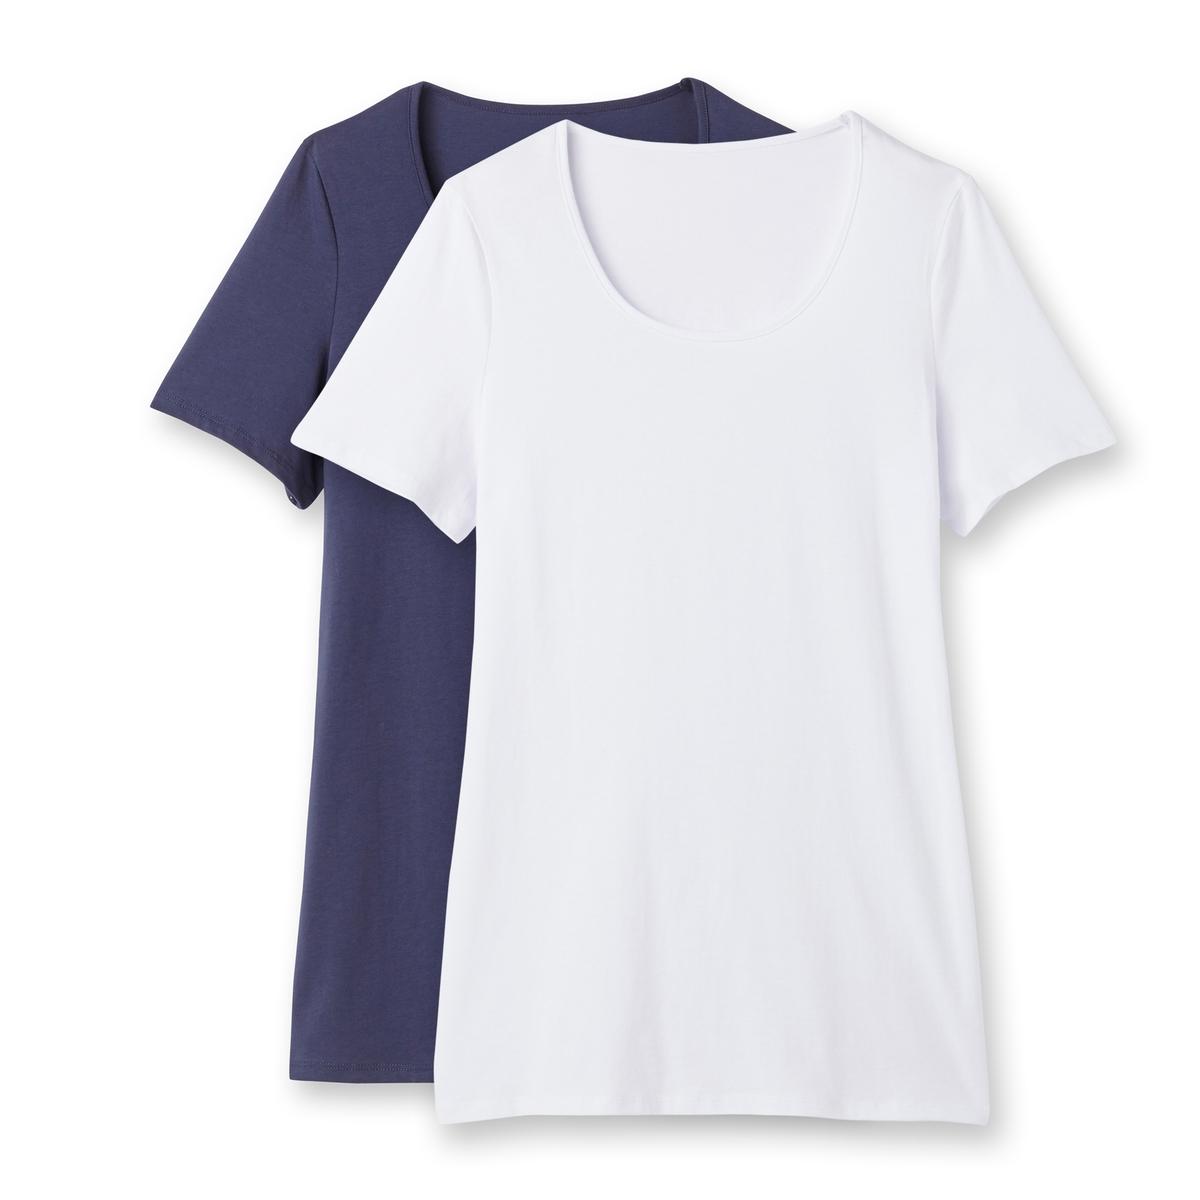 Комплект из 2 футболок с короткими рукавами